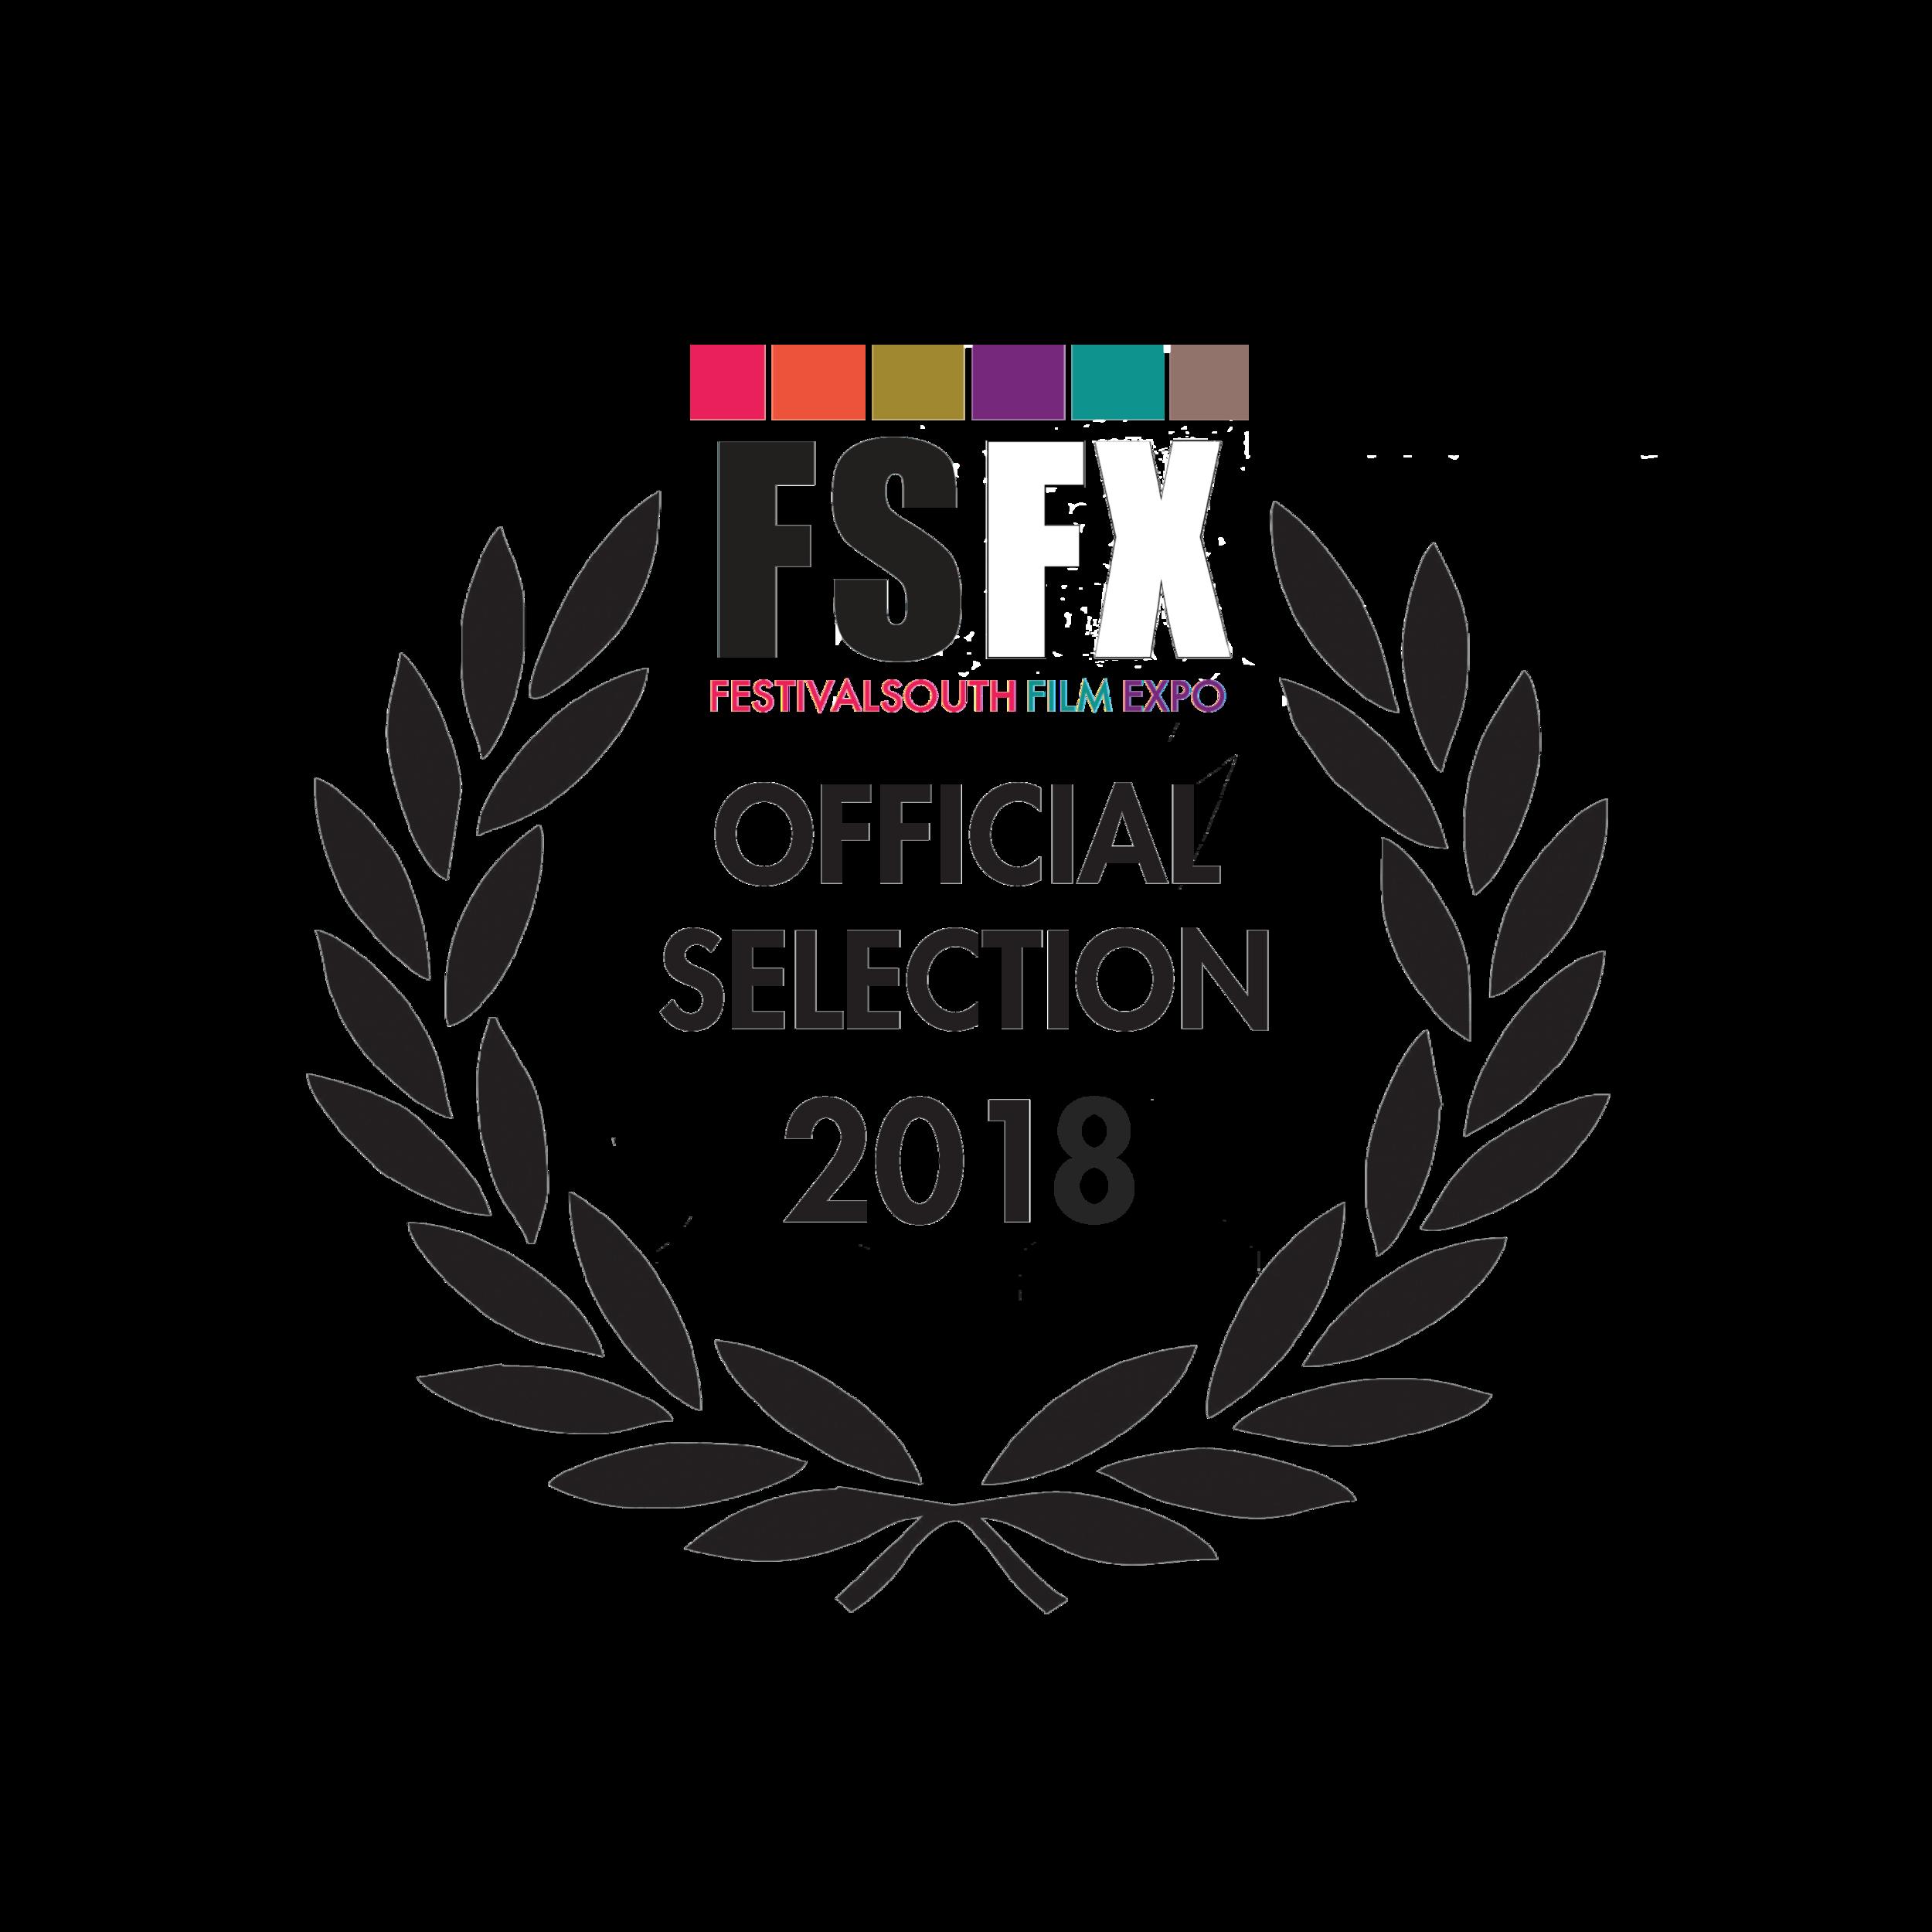 FSFX2018officialselection.png